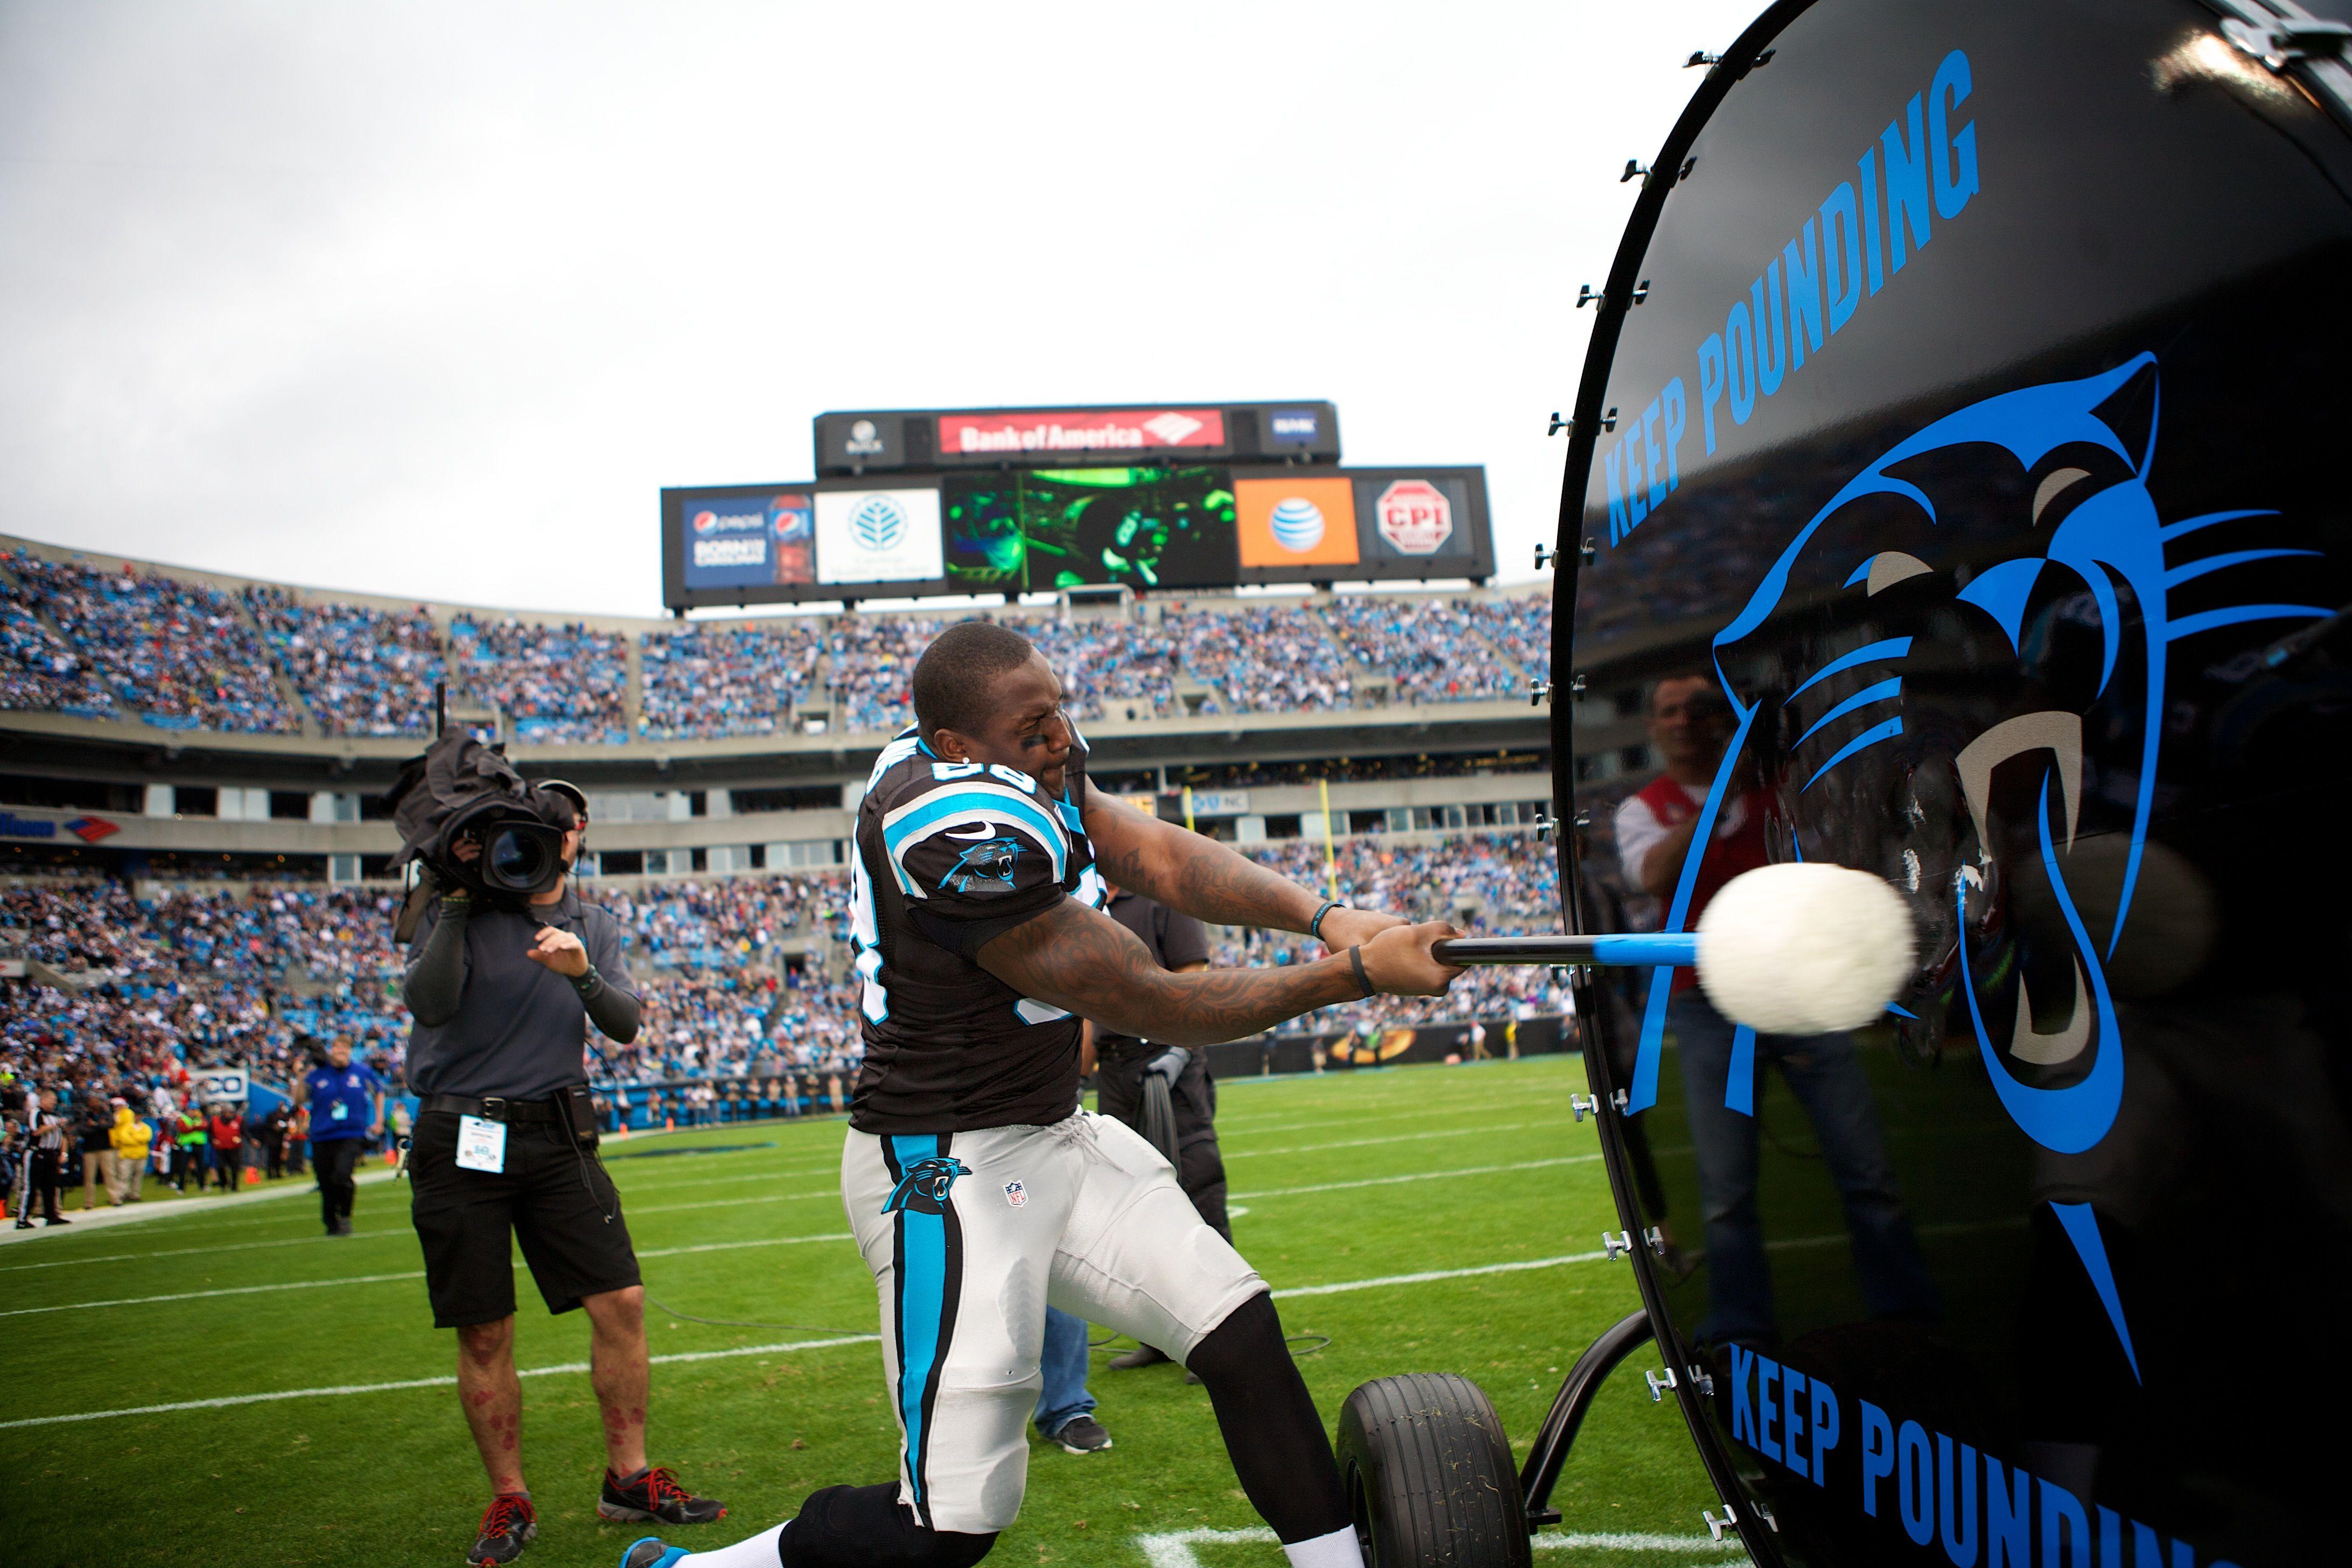 Panthers LB Thomas Davis Keep Pounding Drummers